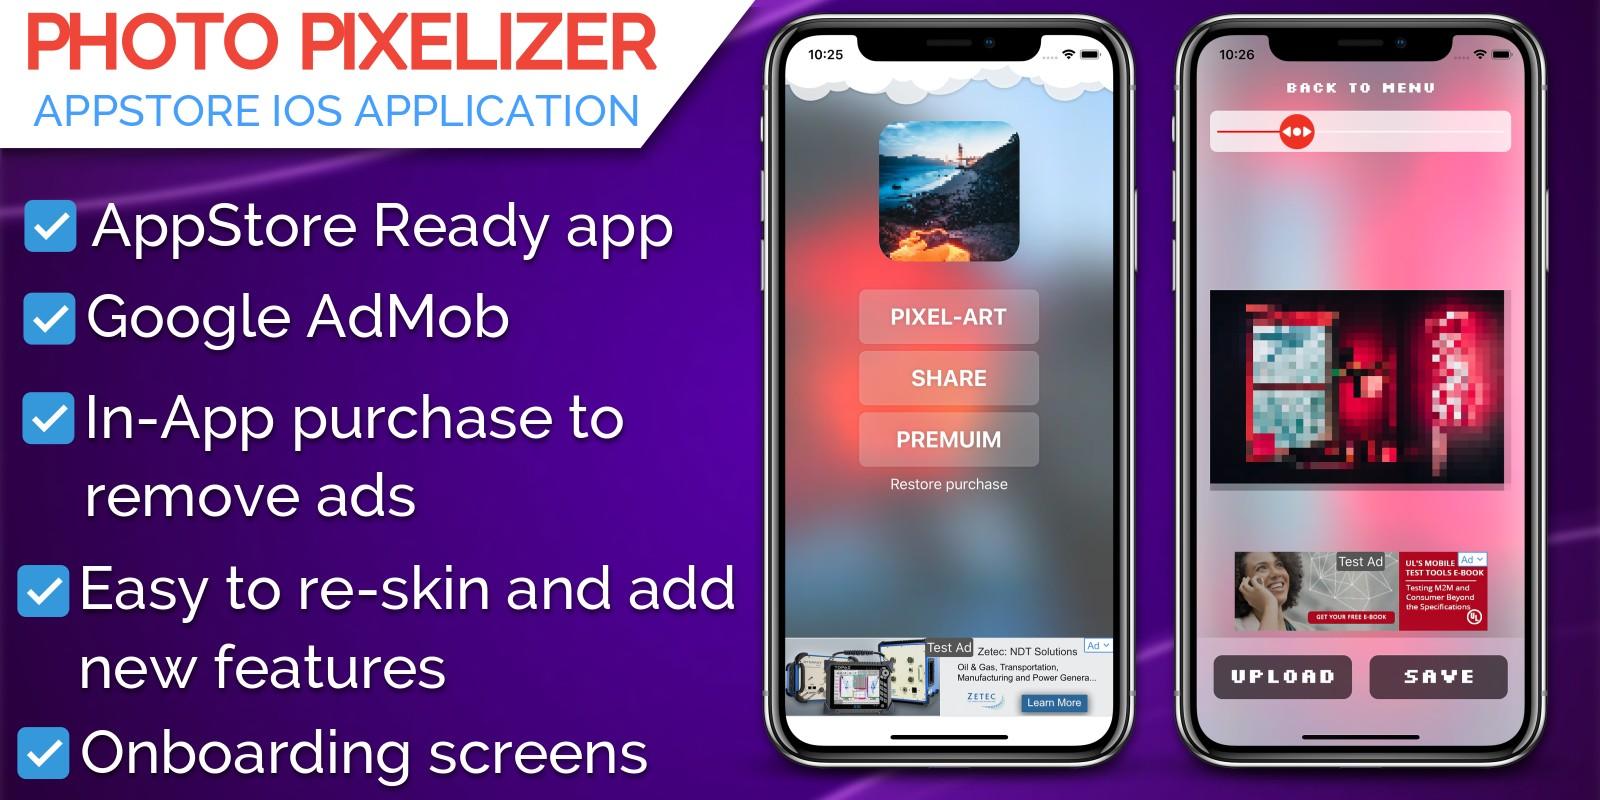 Photo Pixelizer iOS Application Source Code